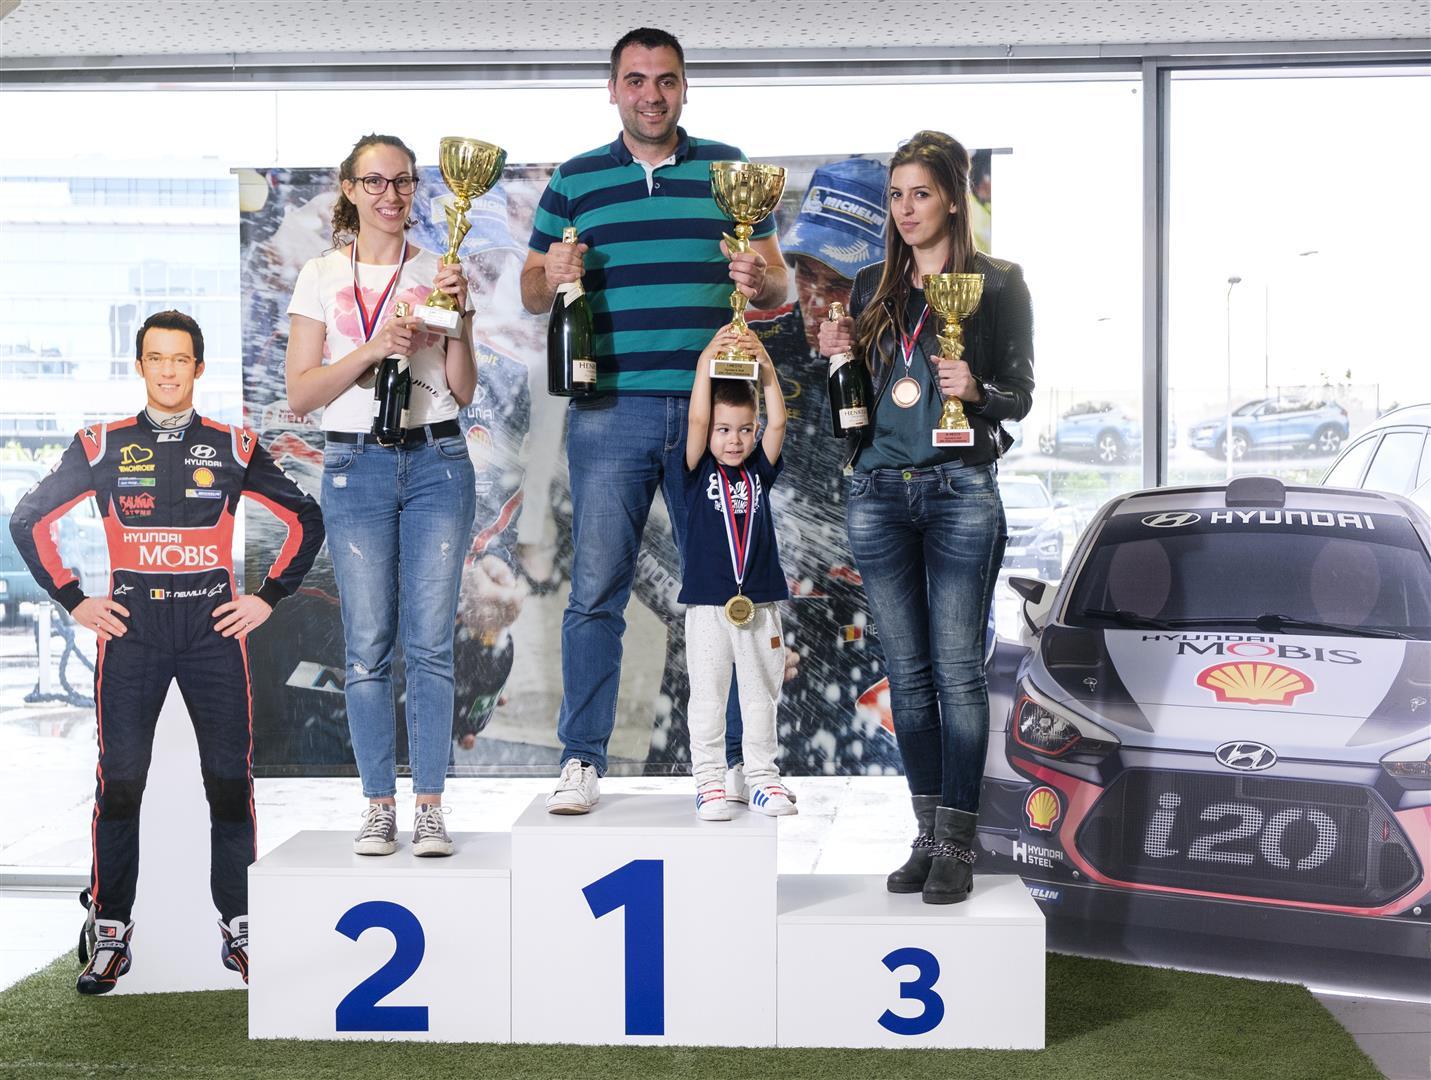 Shell Orbico i Hyundai Srbija dodelili nagrade